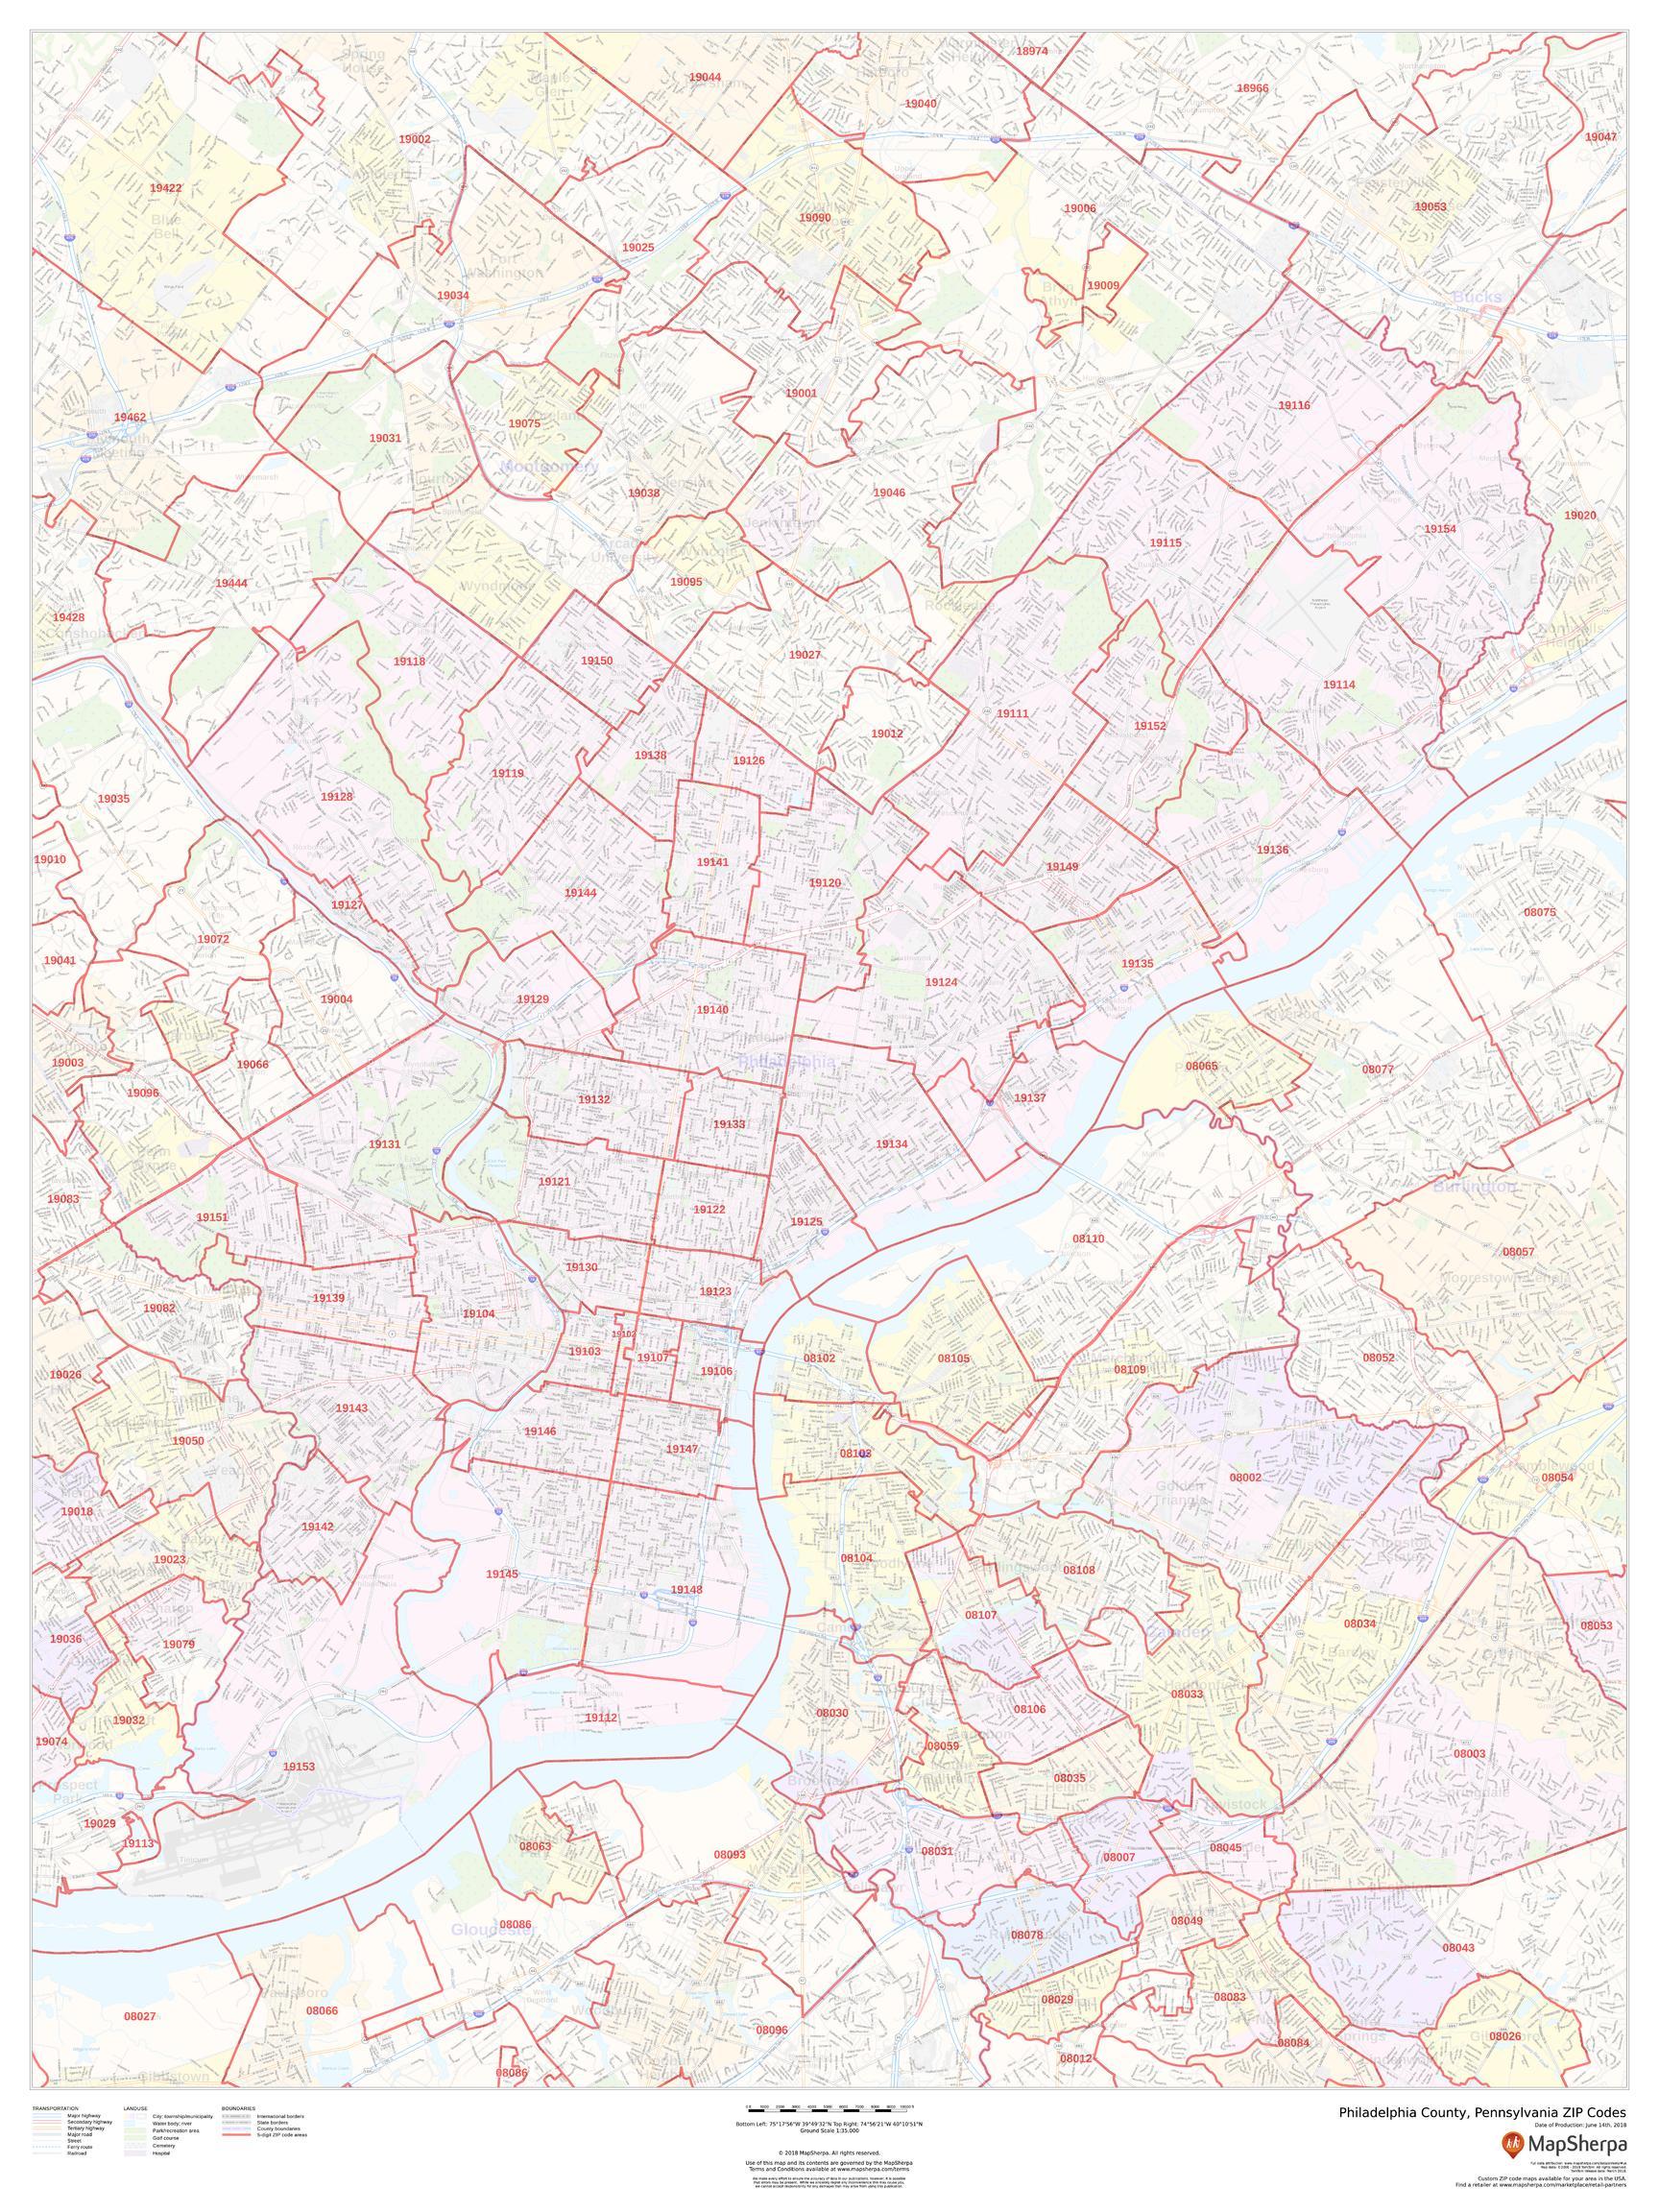 Philadelphia County ZIP Code Map (Pennsylvania) on map of pa flea markets, map of pa schools, map of pa county, map of pa state, map ny zip code, map usa zip code, map of pa municipality, map of pa country, map of pa city, map of pa congressional districts, map of pa industry, map of pa area,